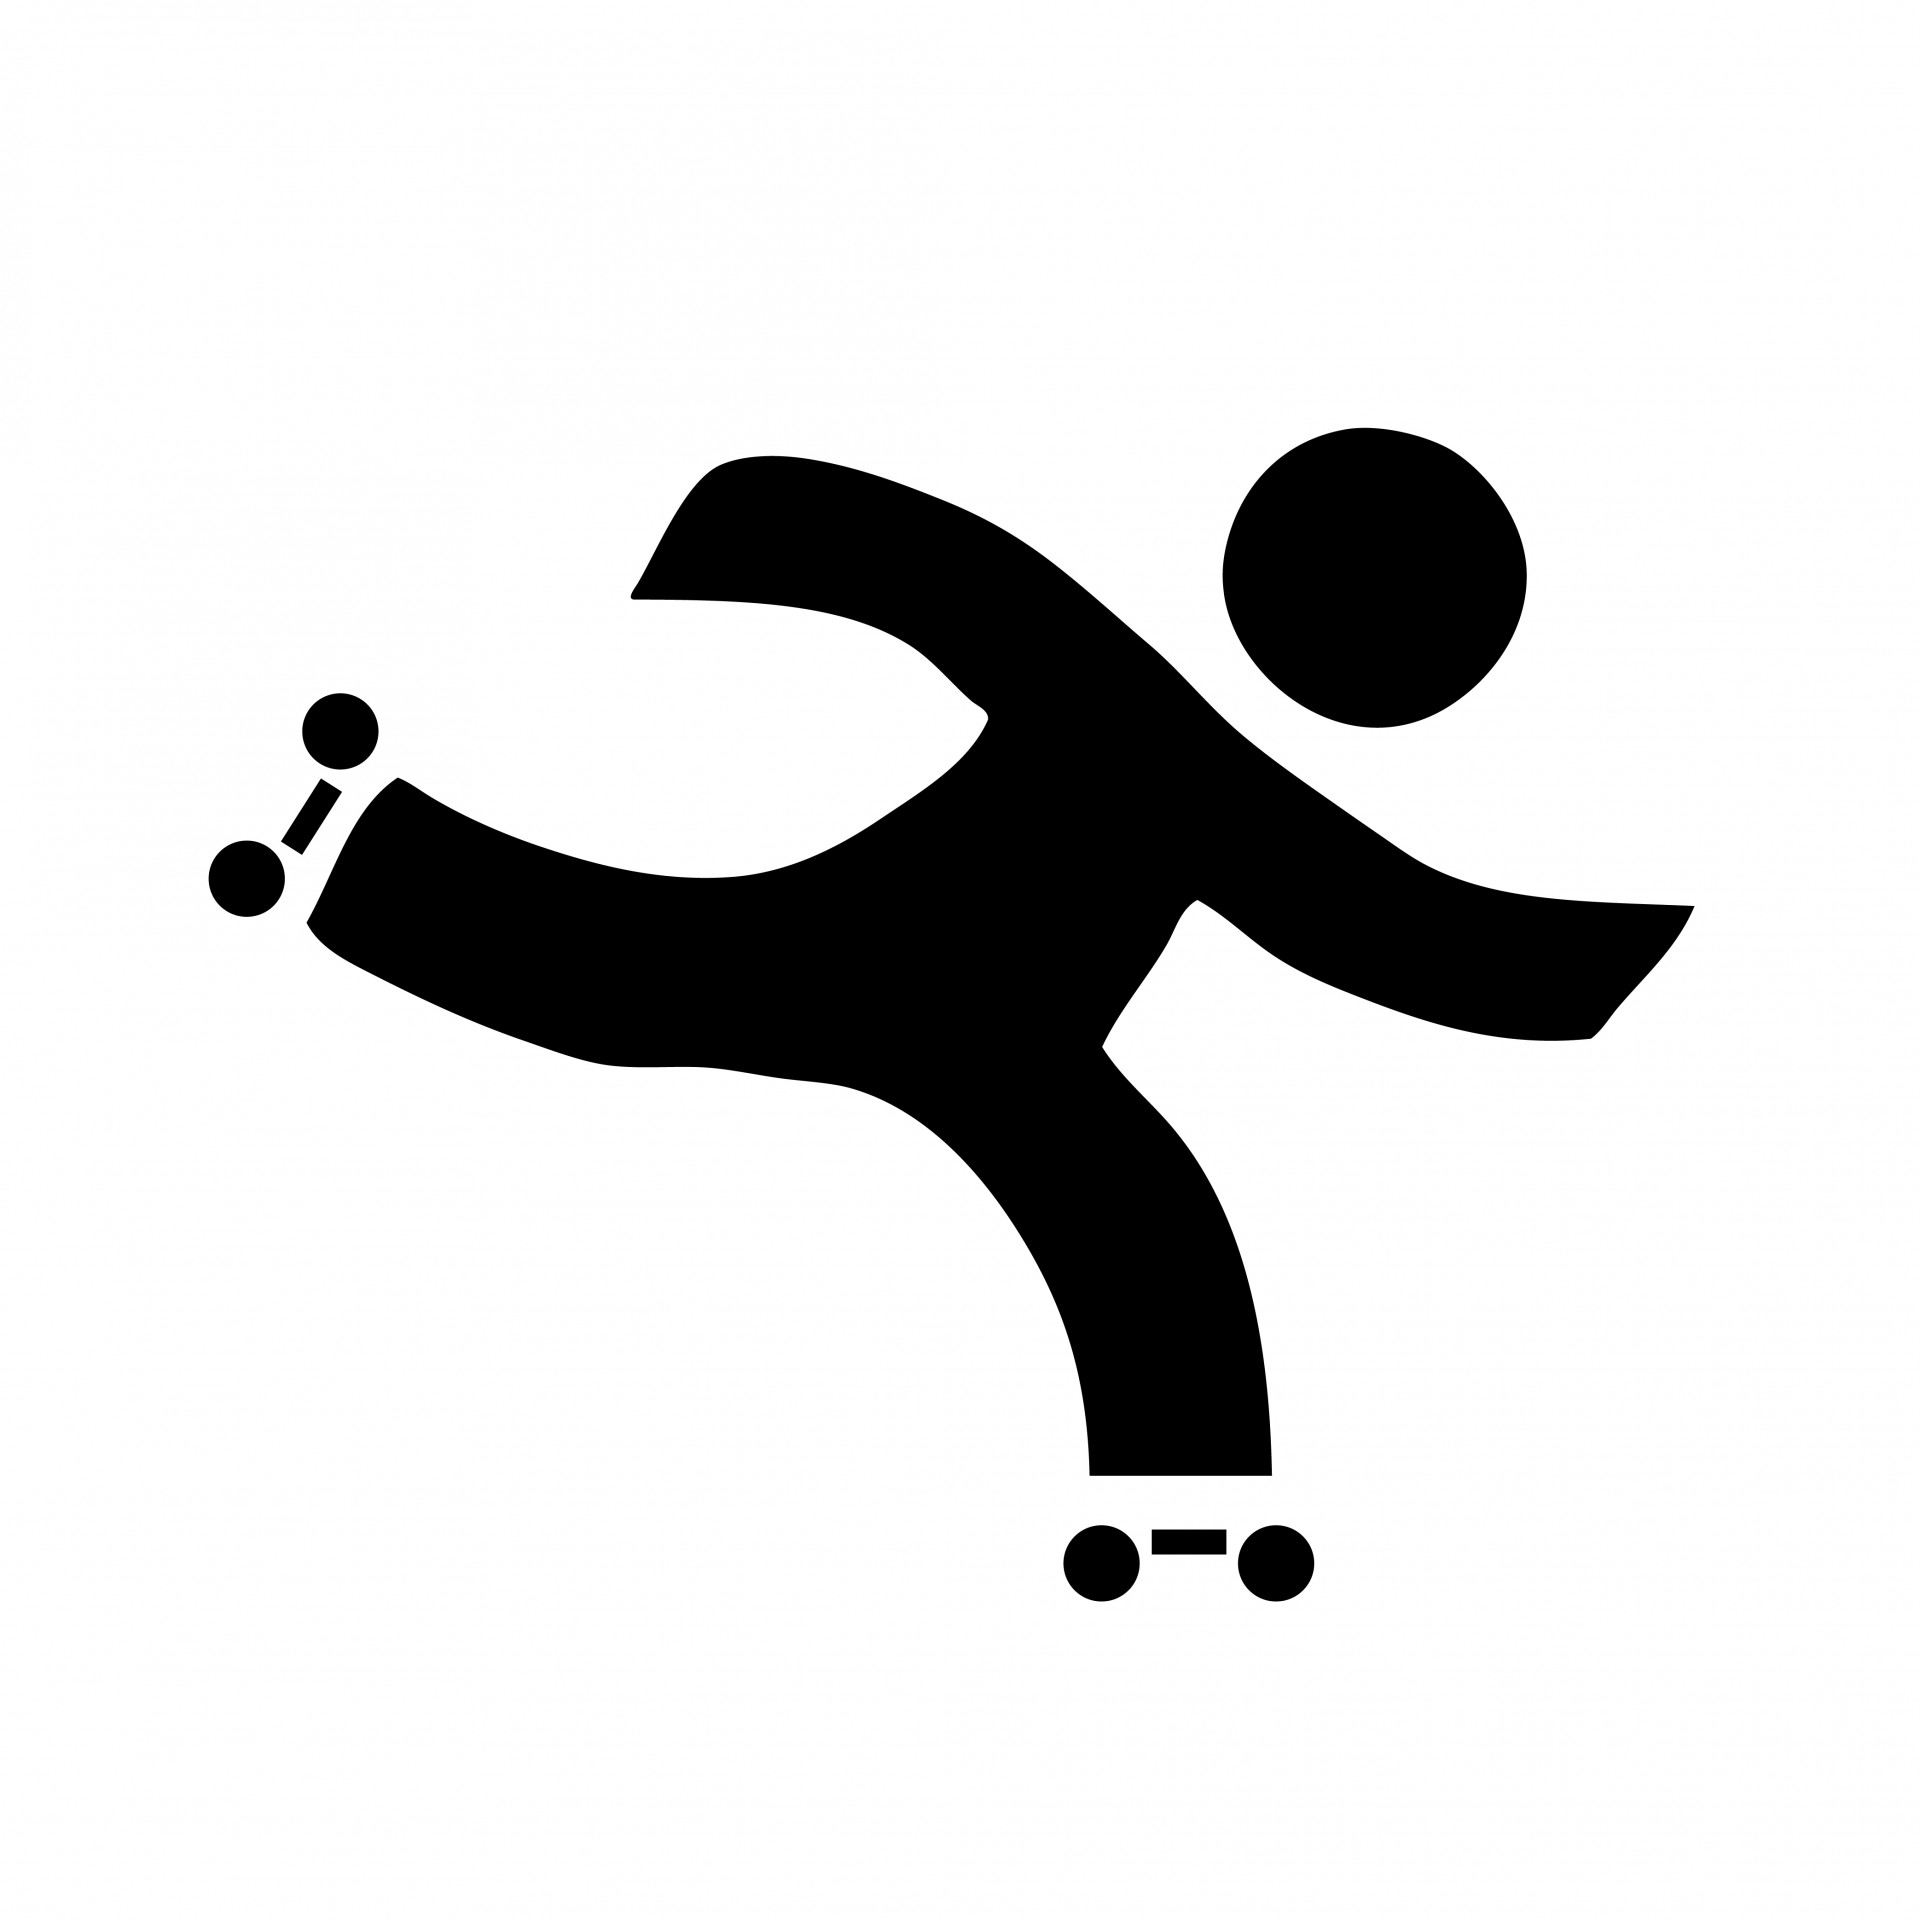 Roller skating,skating,black,silhouette,clipart.